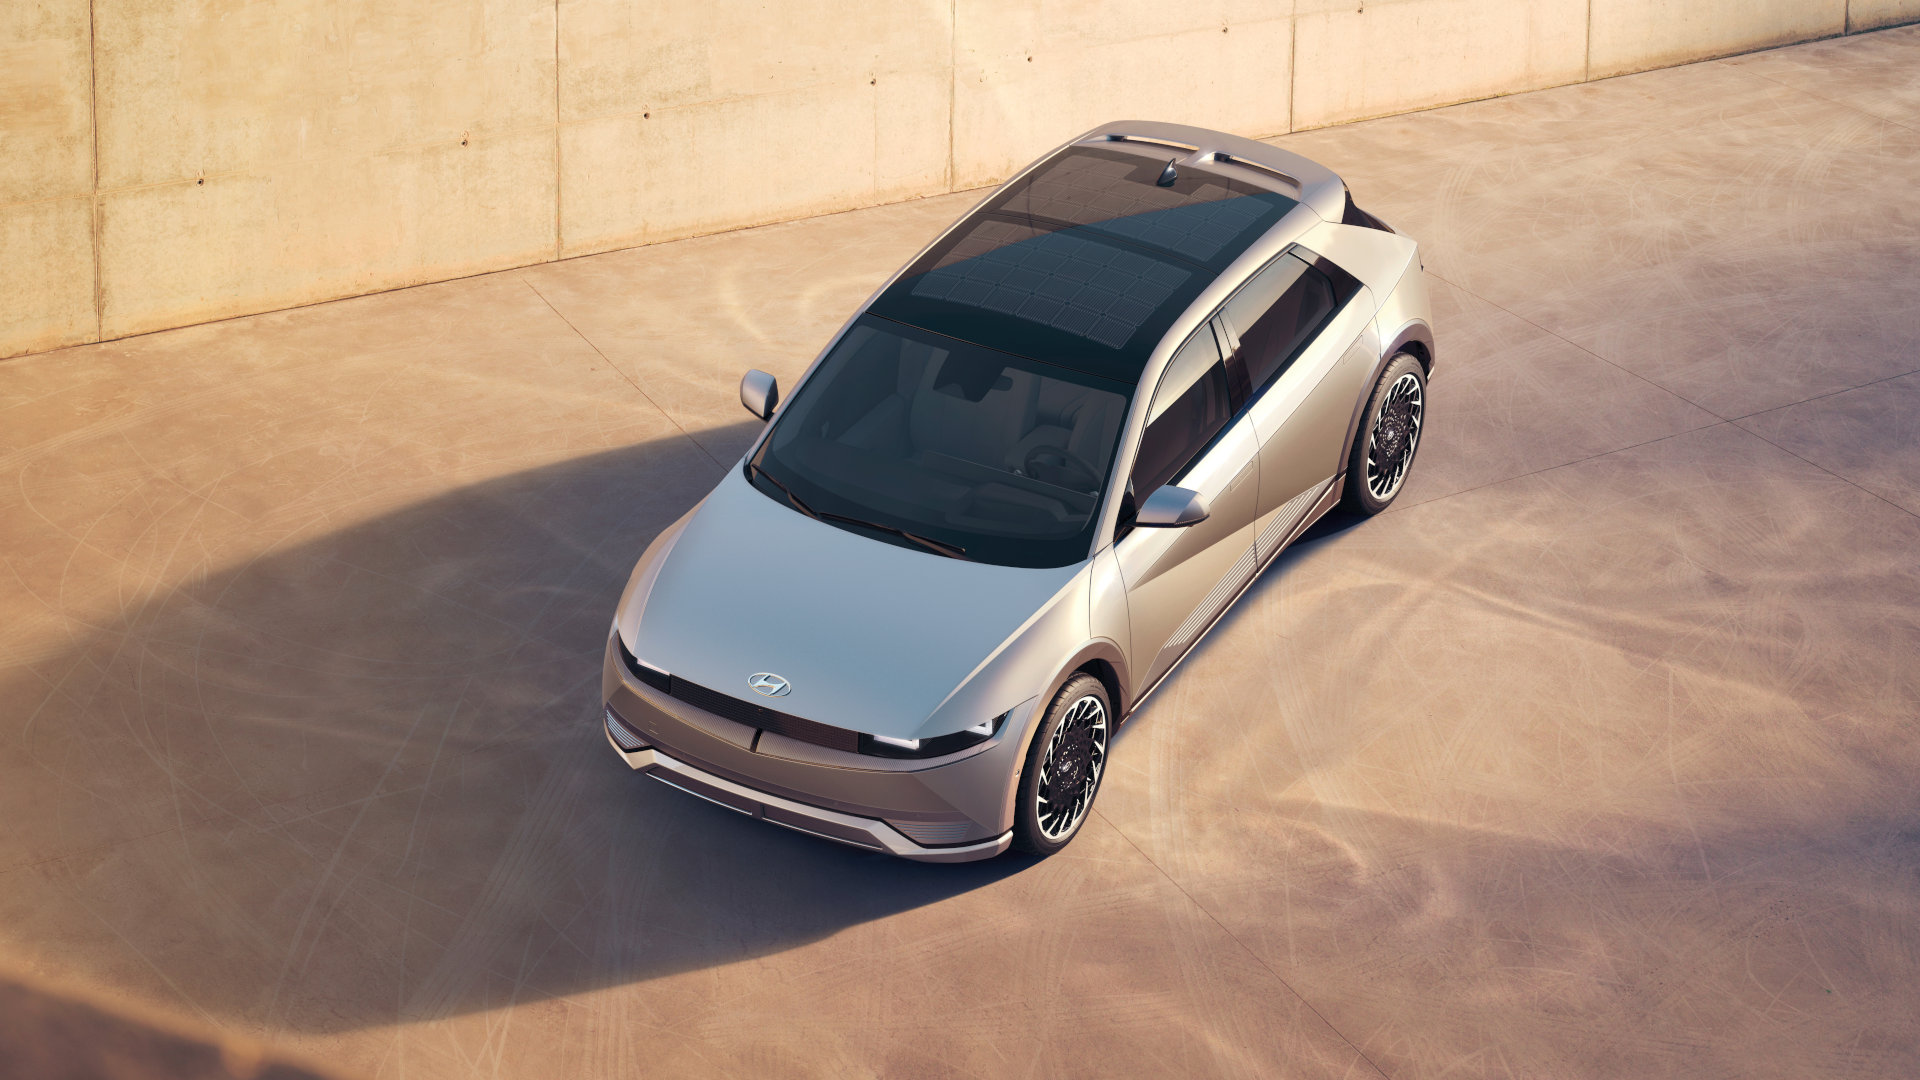 Hyundai Ioniq 5 top view angle